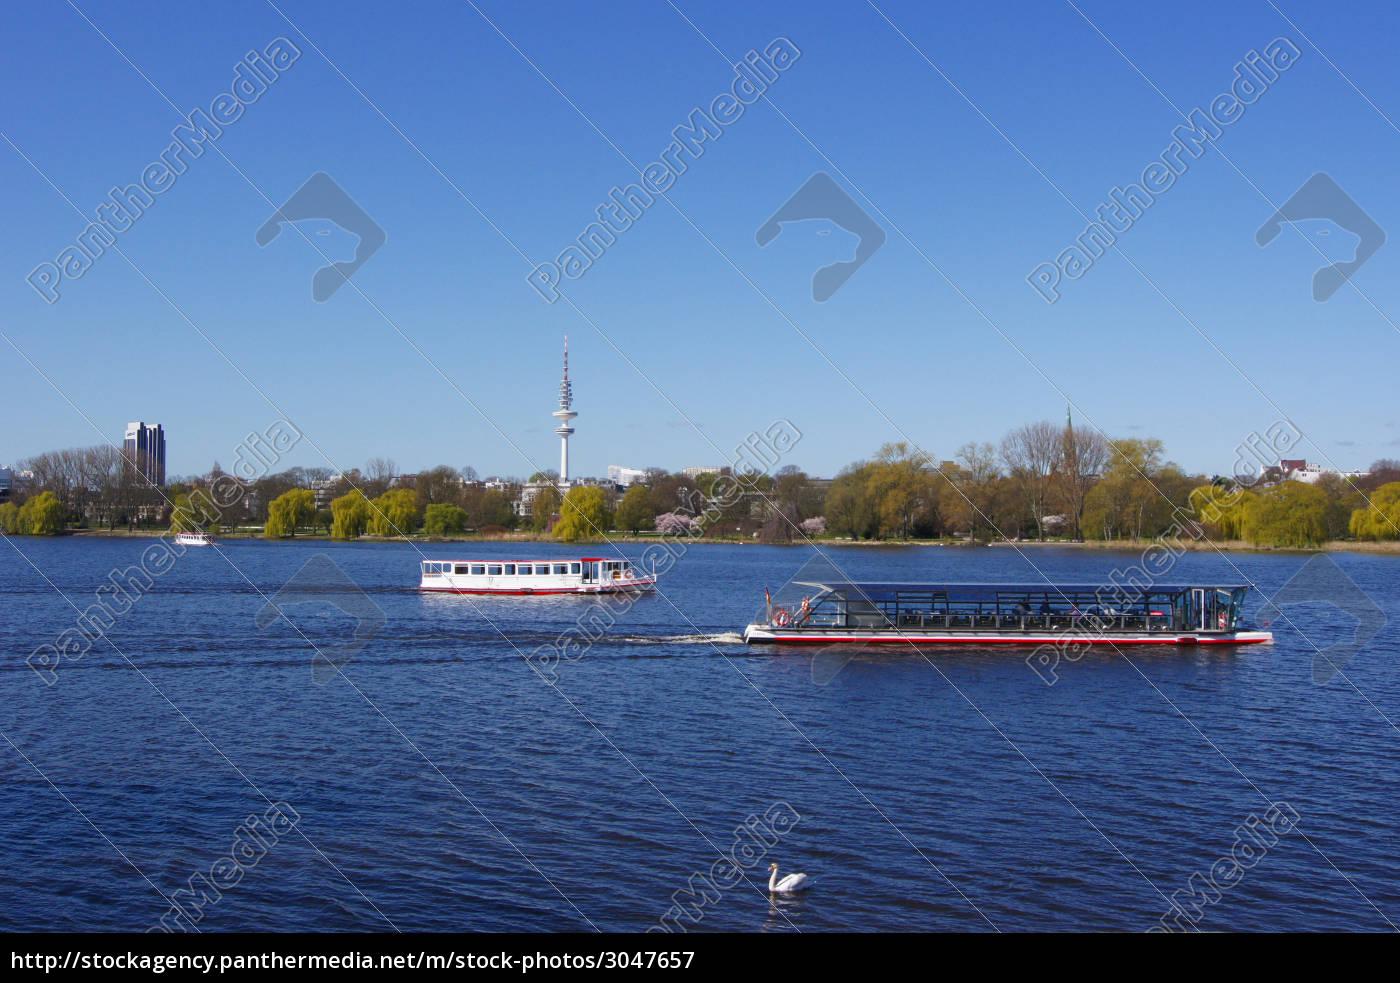 hamburg, kunstige sø, ferskvand, sø, vand, alster - 3047657